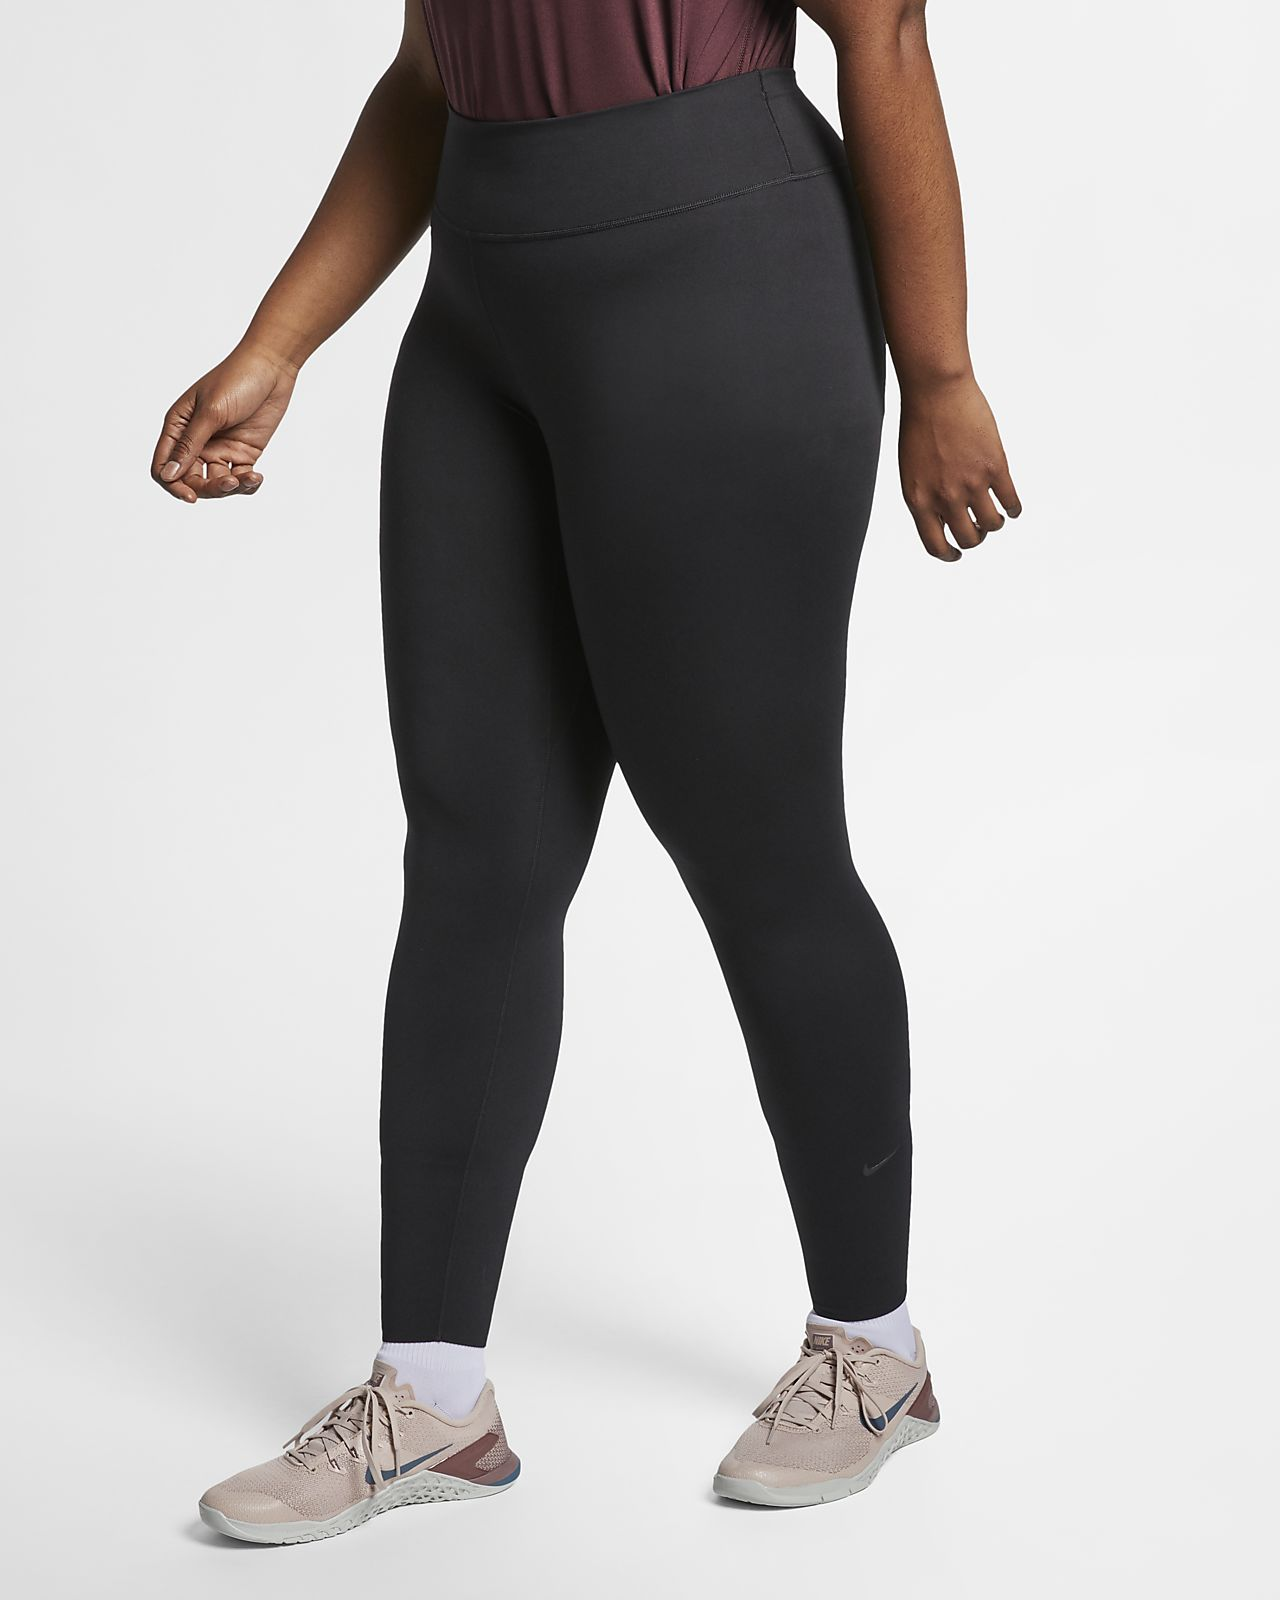 Женские тайтсы Nike One Luxe (большие размеры)